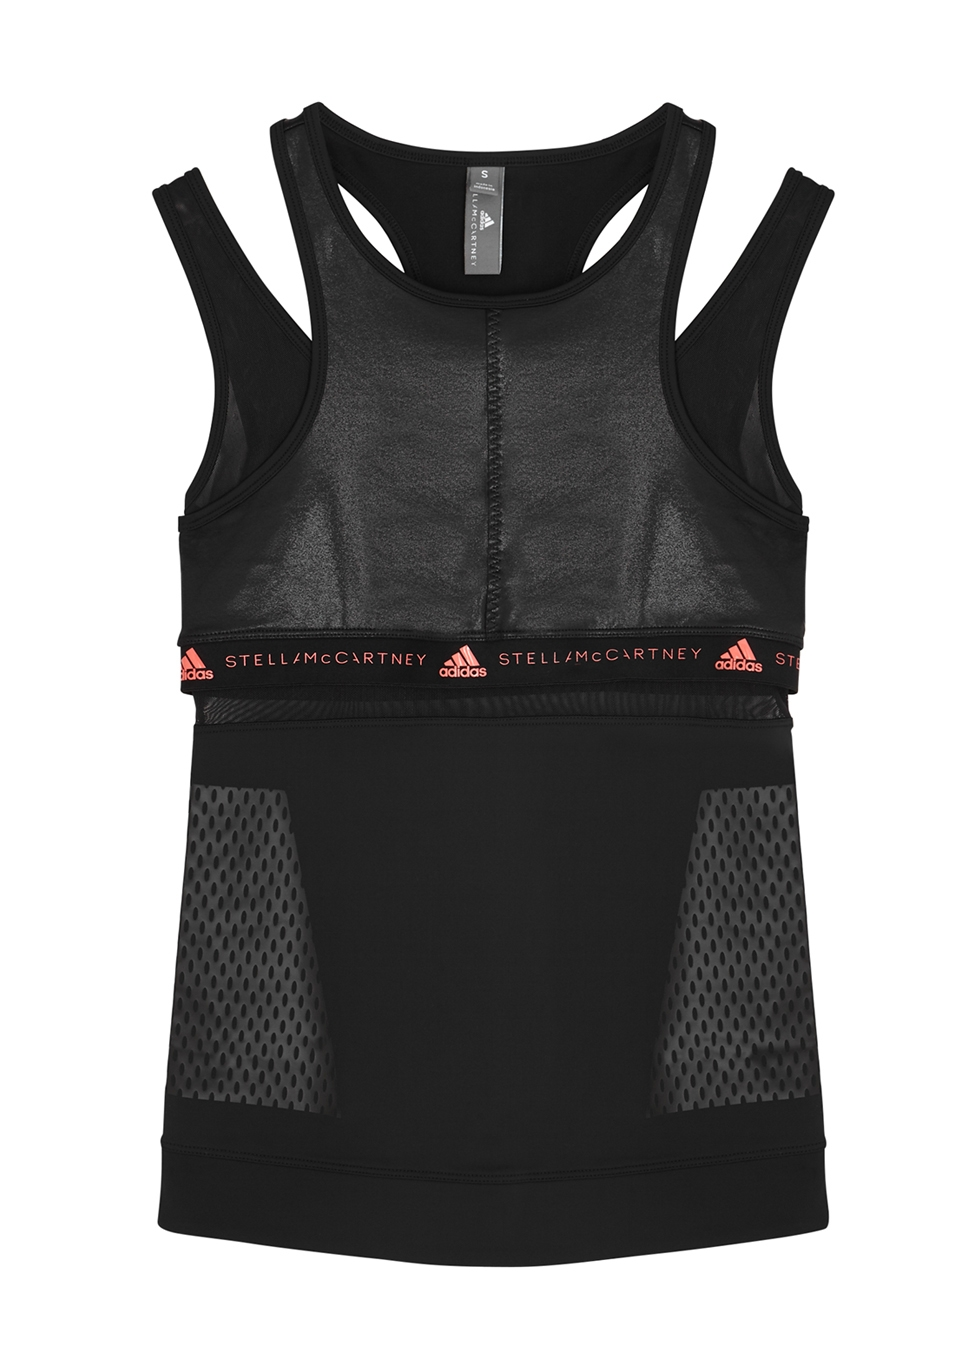 Black layered top - adidas X Stella McCartney